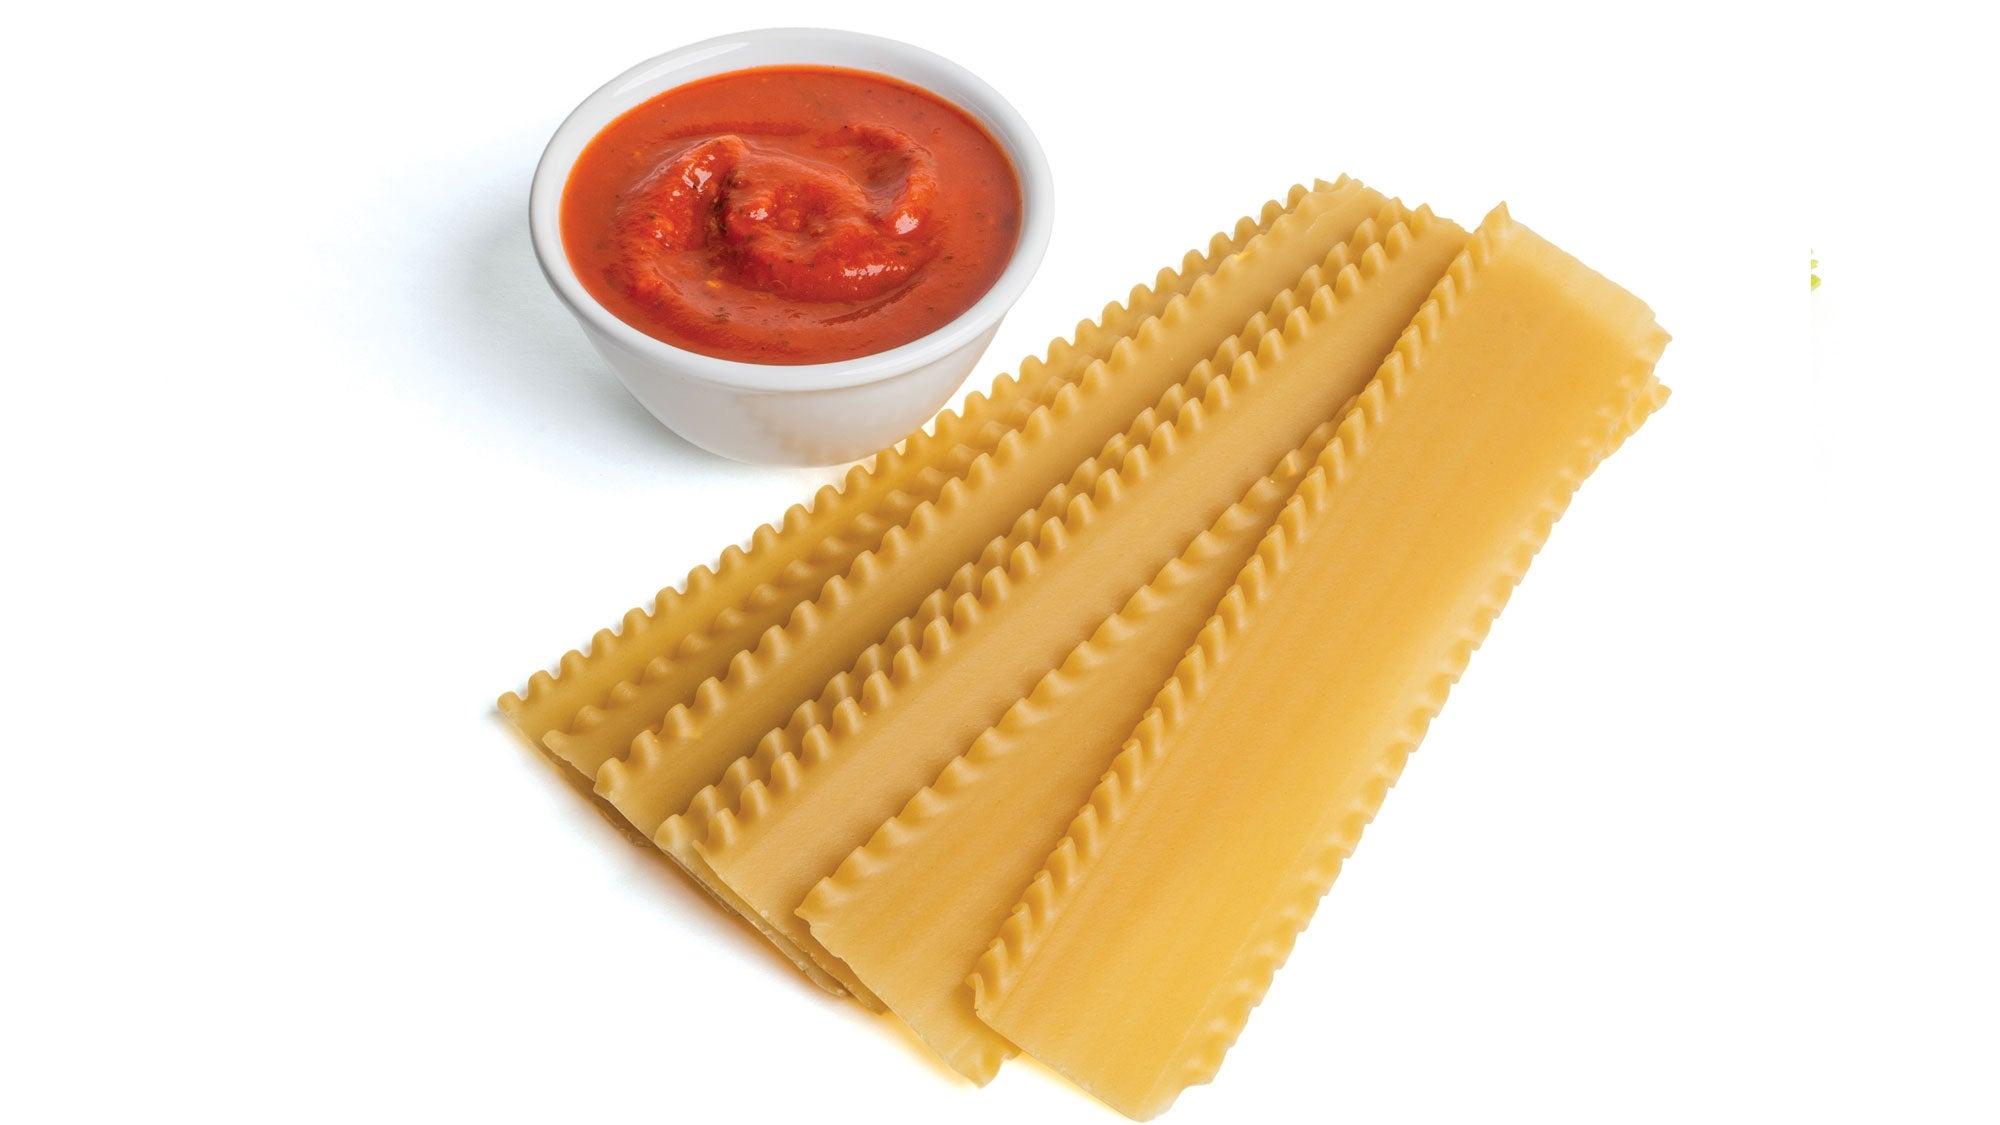 Lasagna ingredients - brown rice noodles and marinara sauce